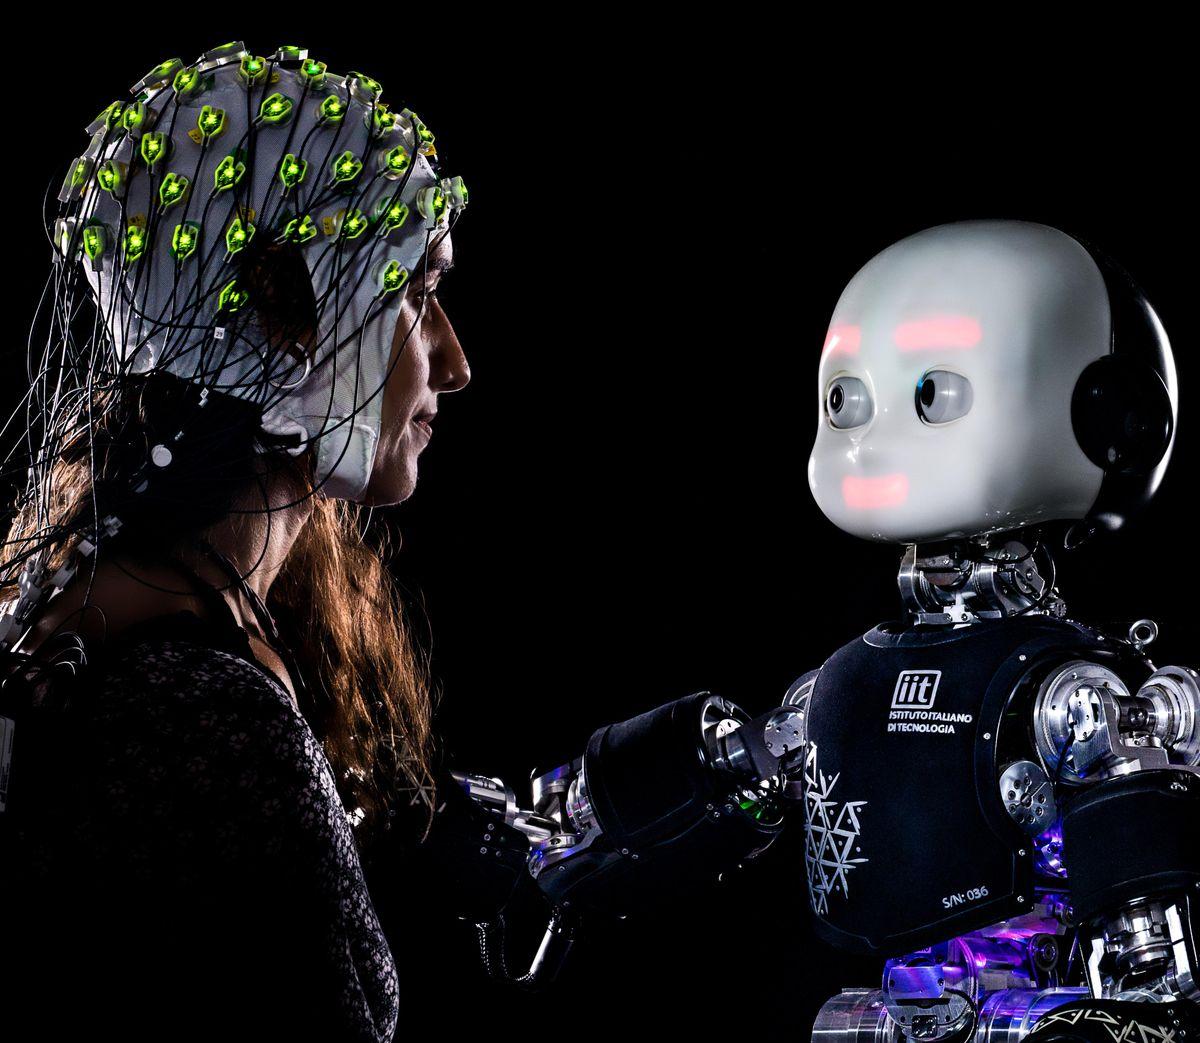 A humanoid robot gazing at a human wearing a sensorized hat